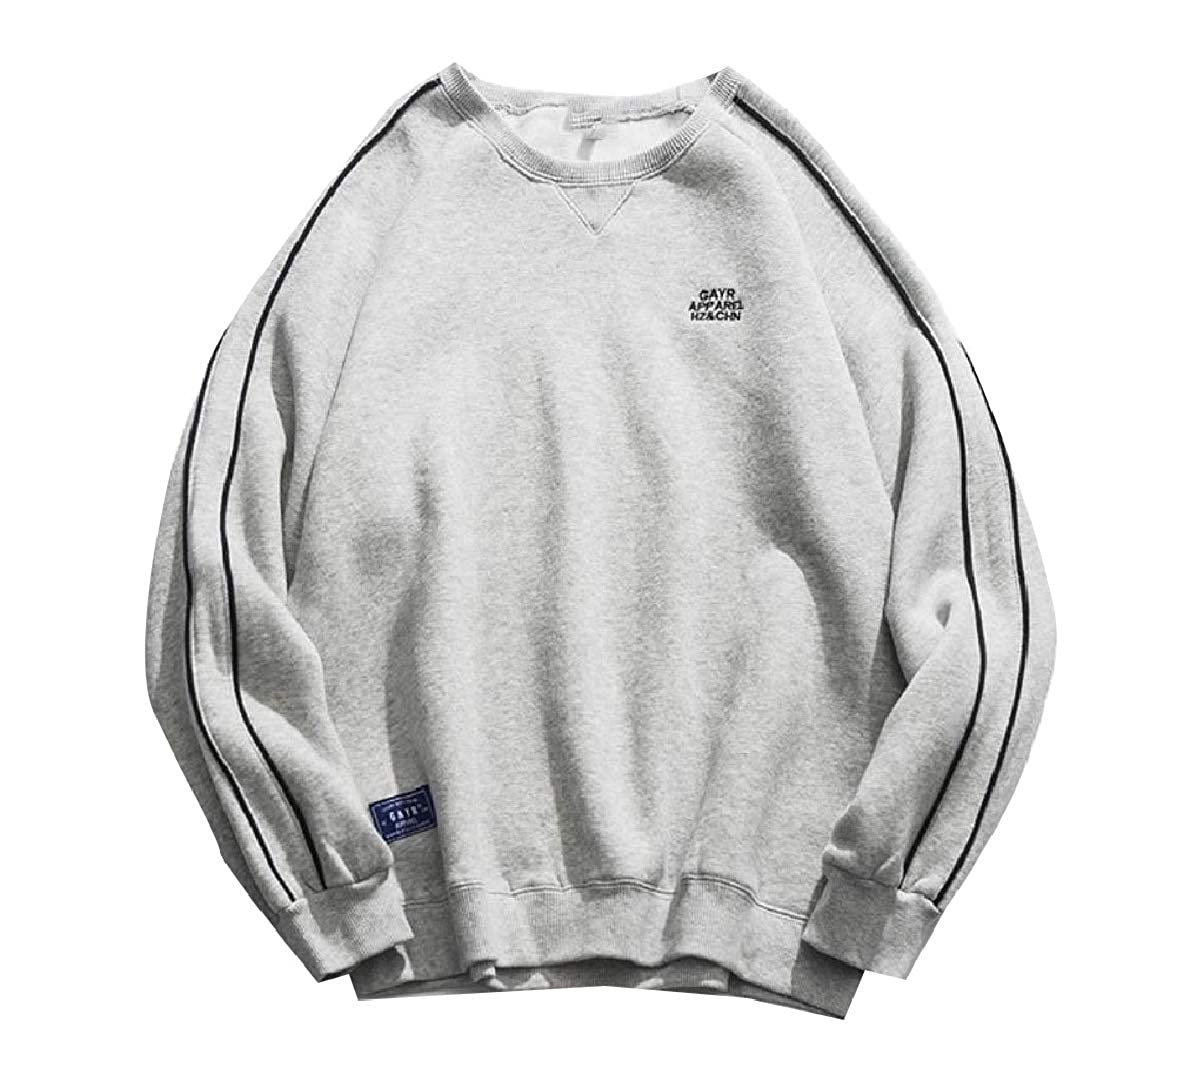 Coolred-Men Fleece Fall Thicken Casual Round Neck Sweatshirts T-Shirt